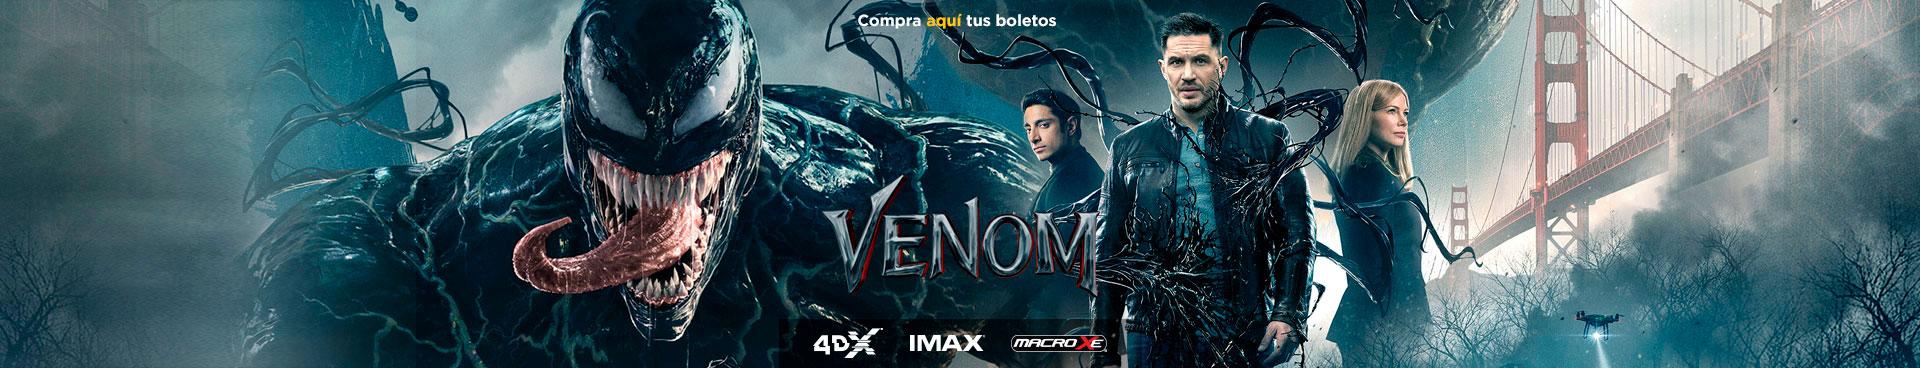 En cartelera: Venom